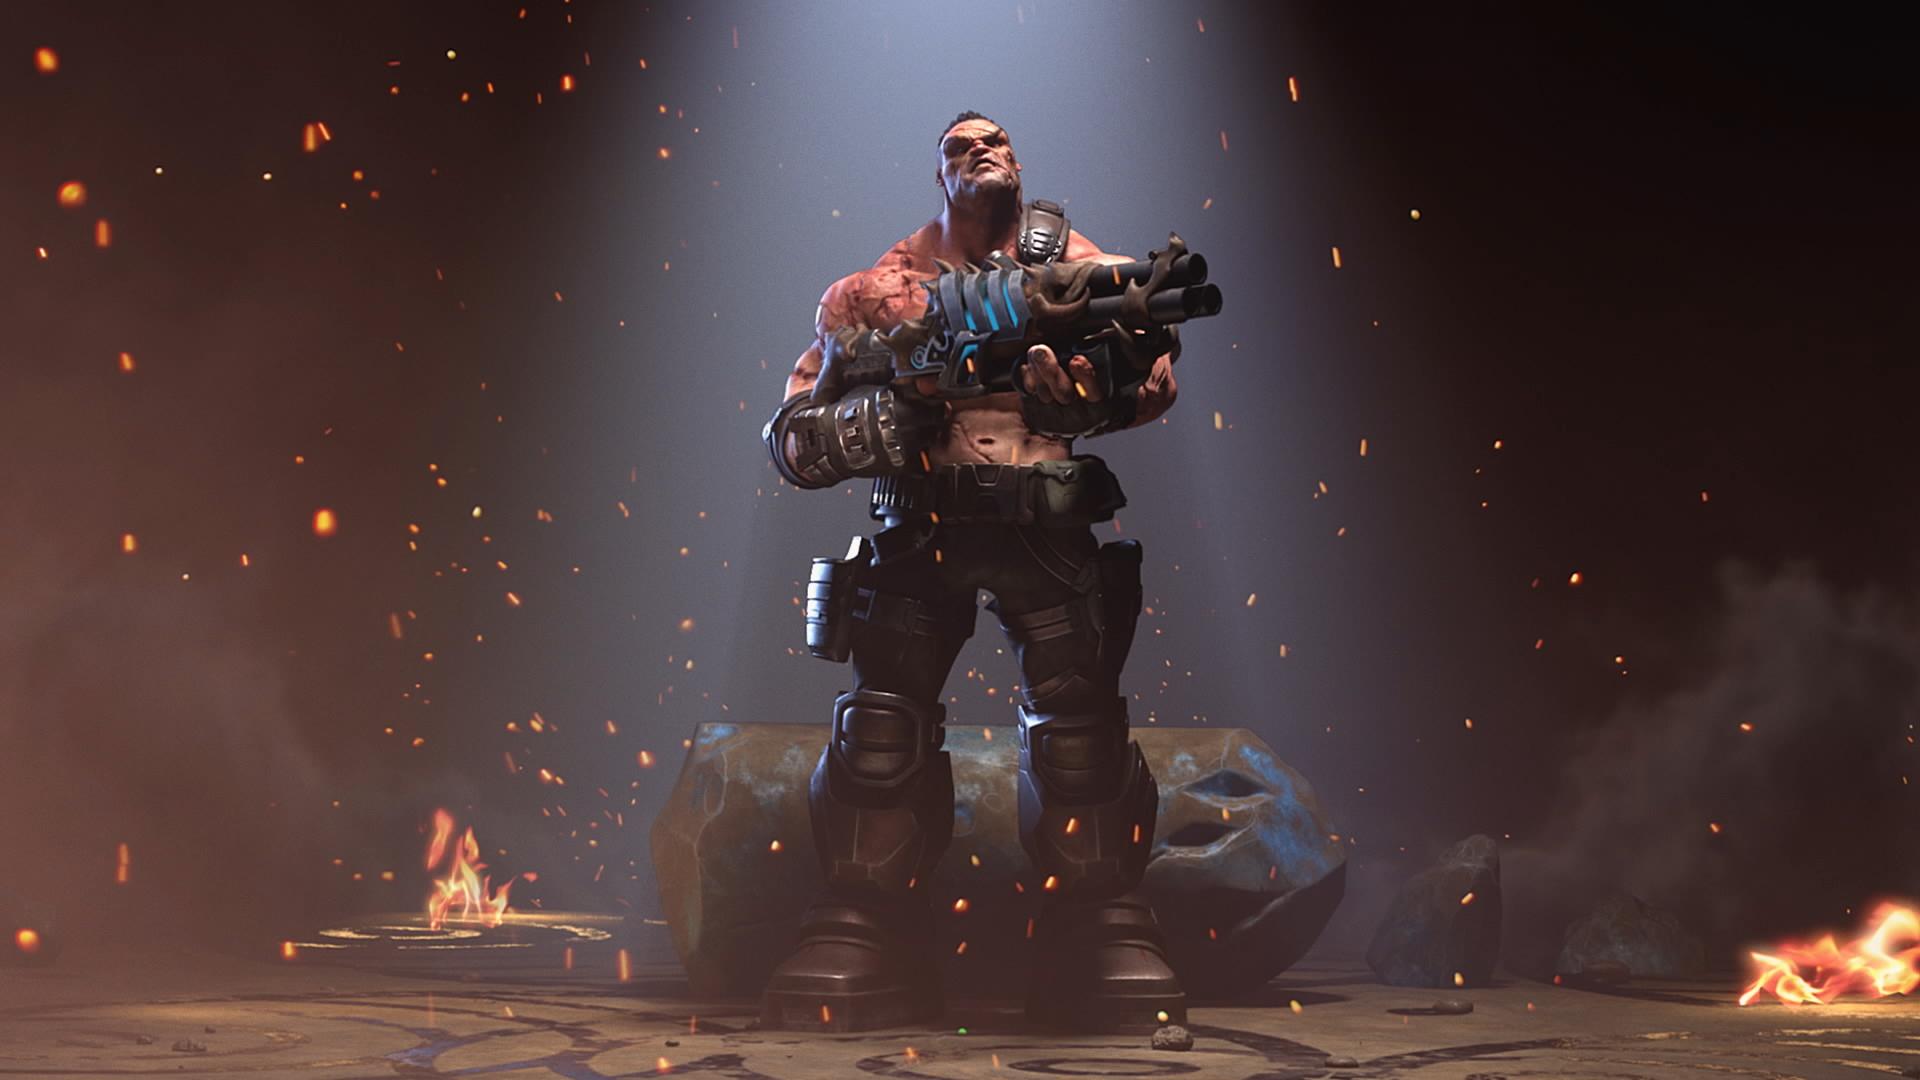 Шутер Hellbound в стиле Doom и Quake доступен бесплатно в Steam Early Access